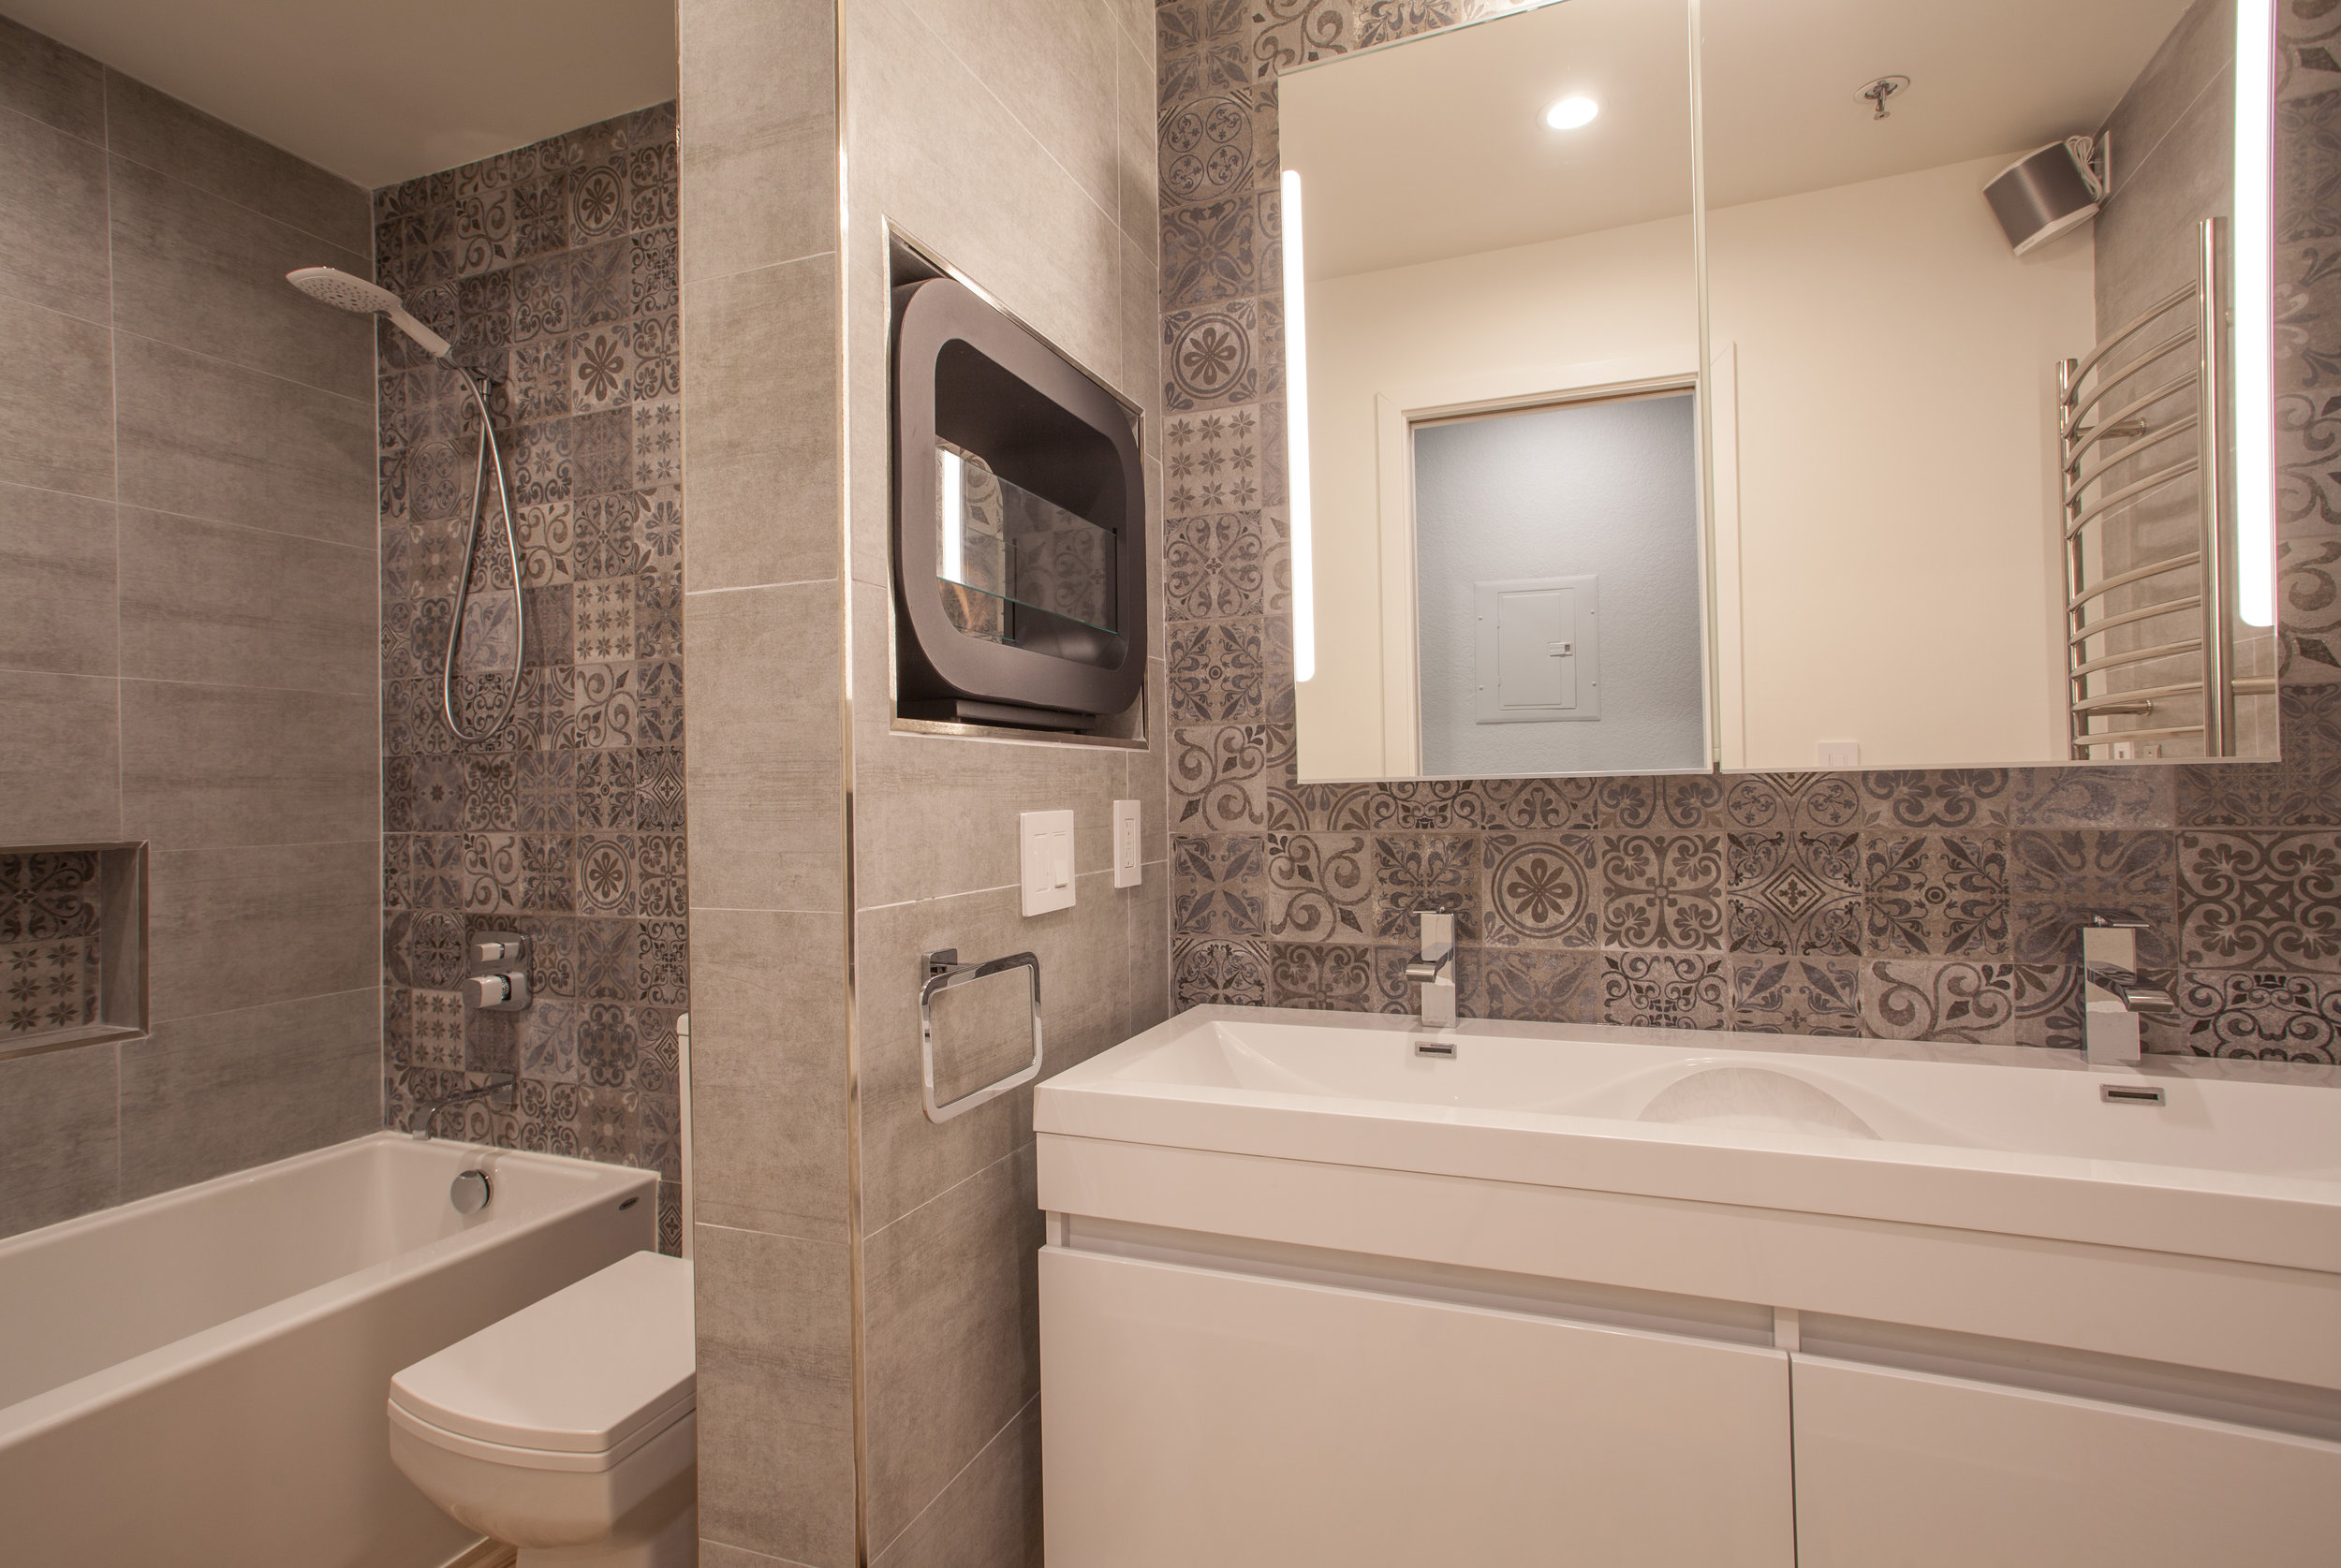 1106_la_terrace_circle_MLS_HID1123238_ROOMfullbathroom1.jpg